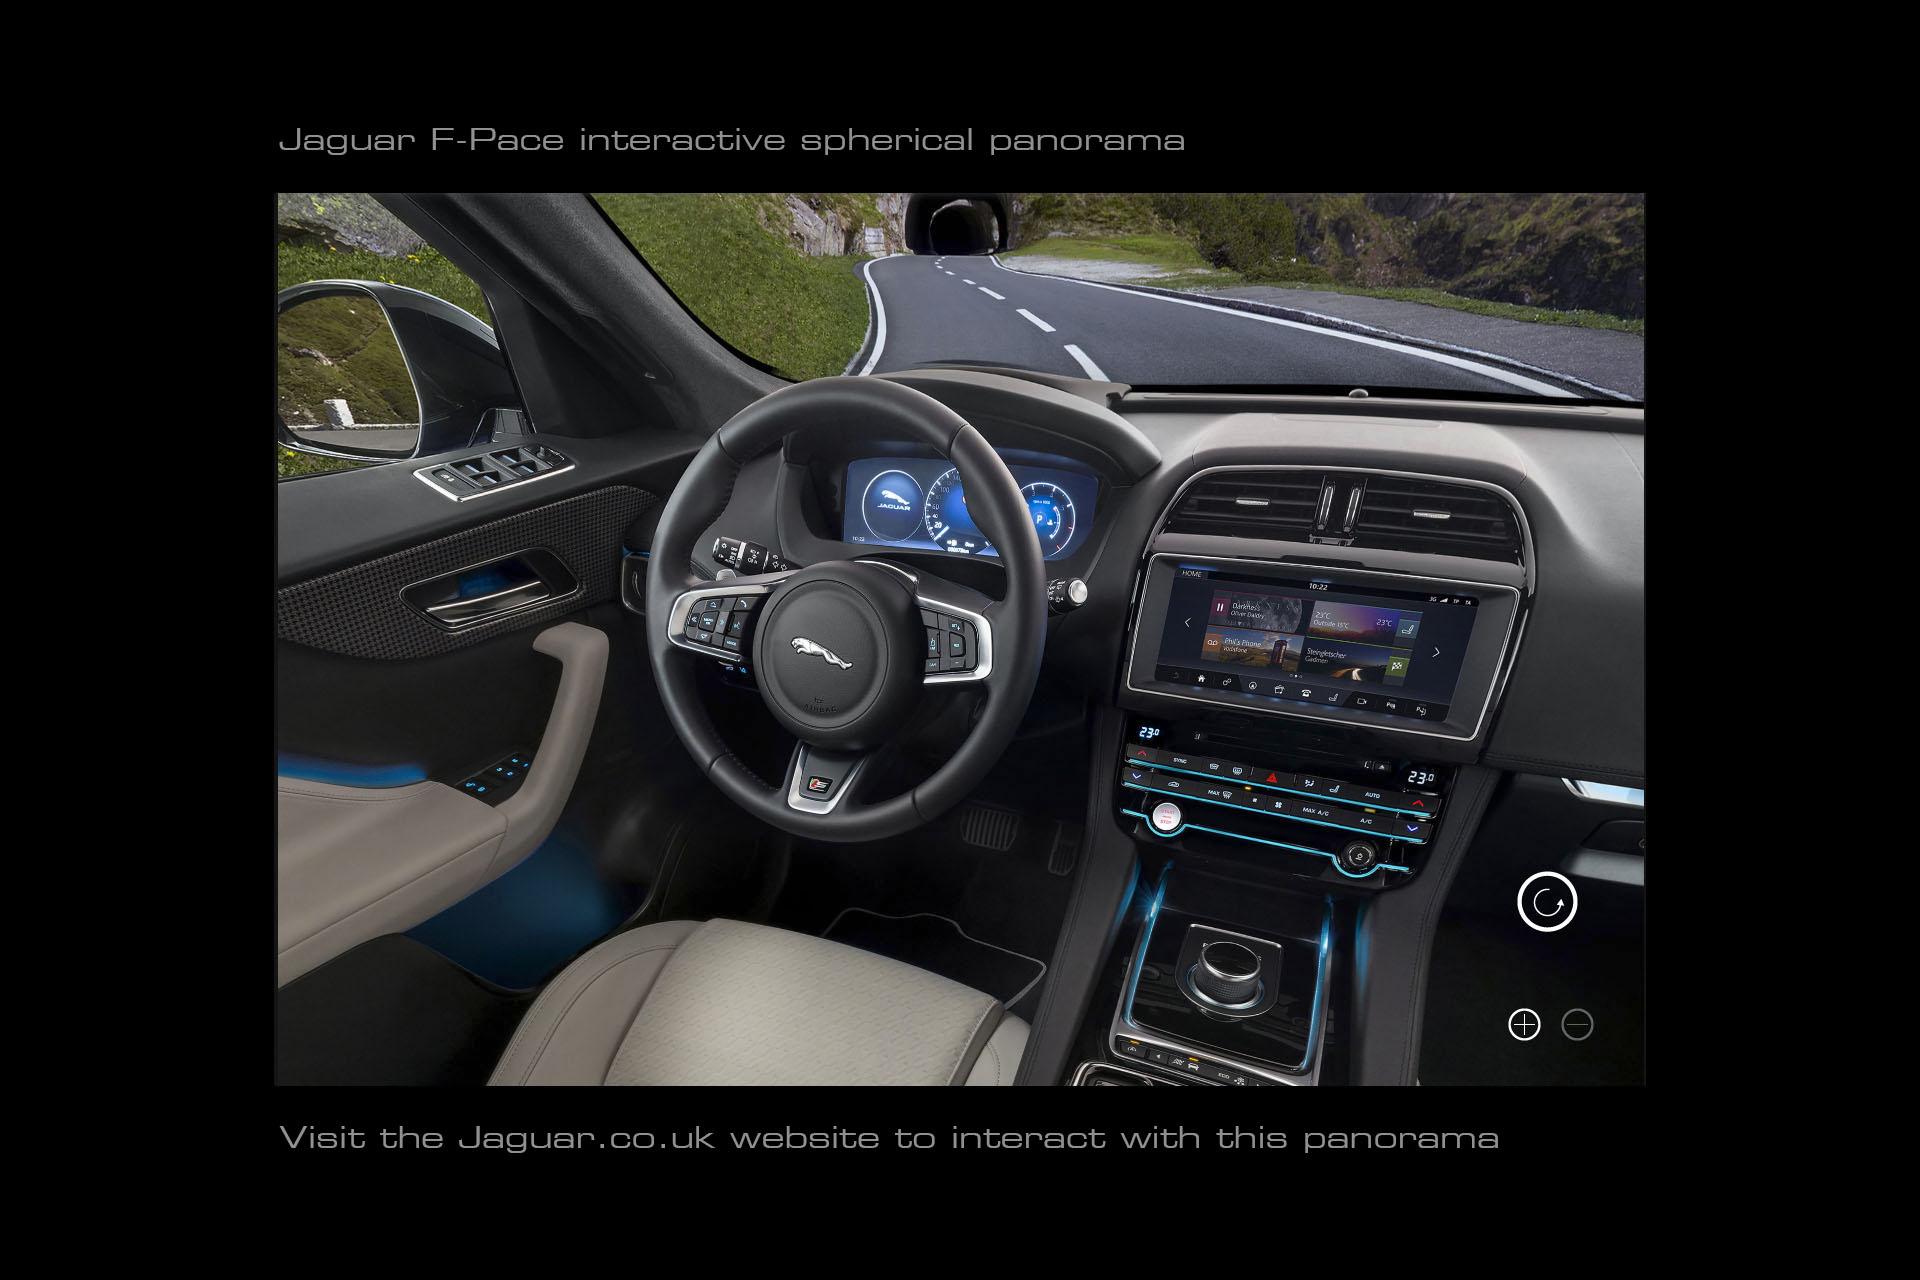 Jaguar F-Pace interior 360 panorama